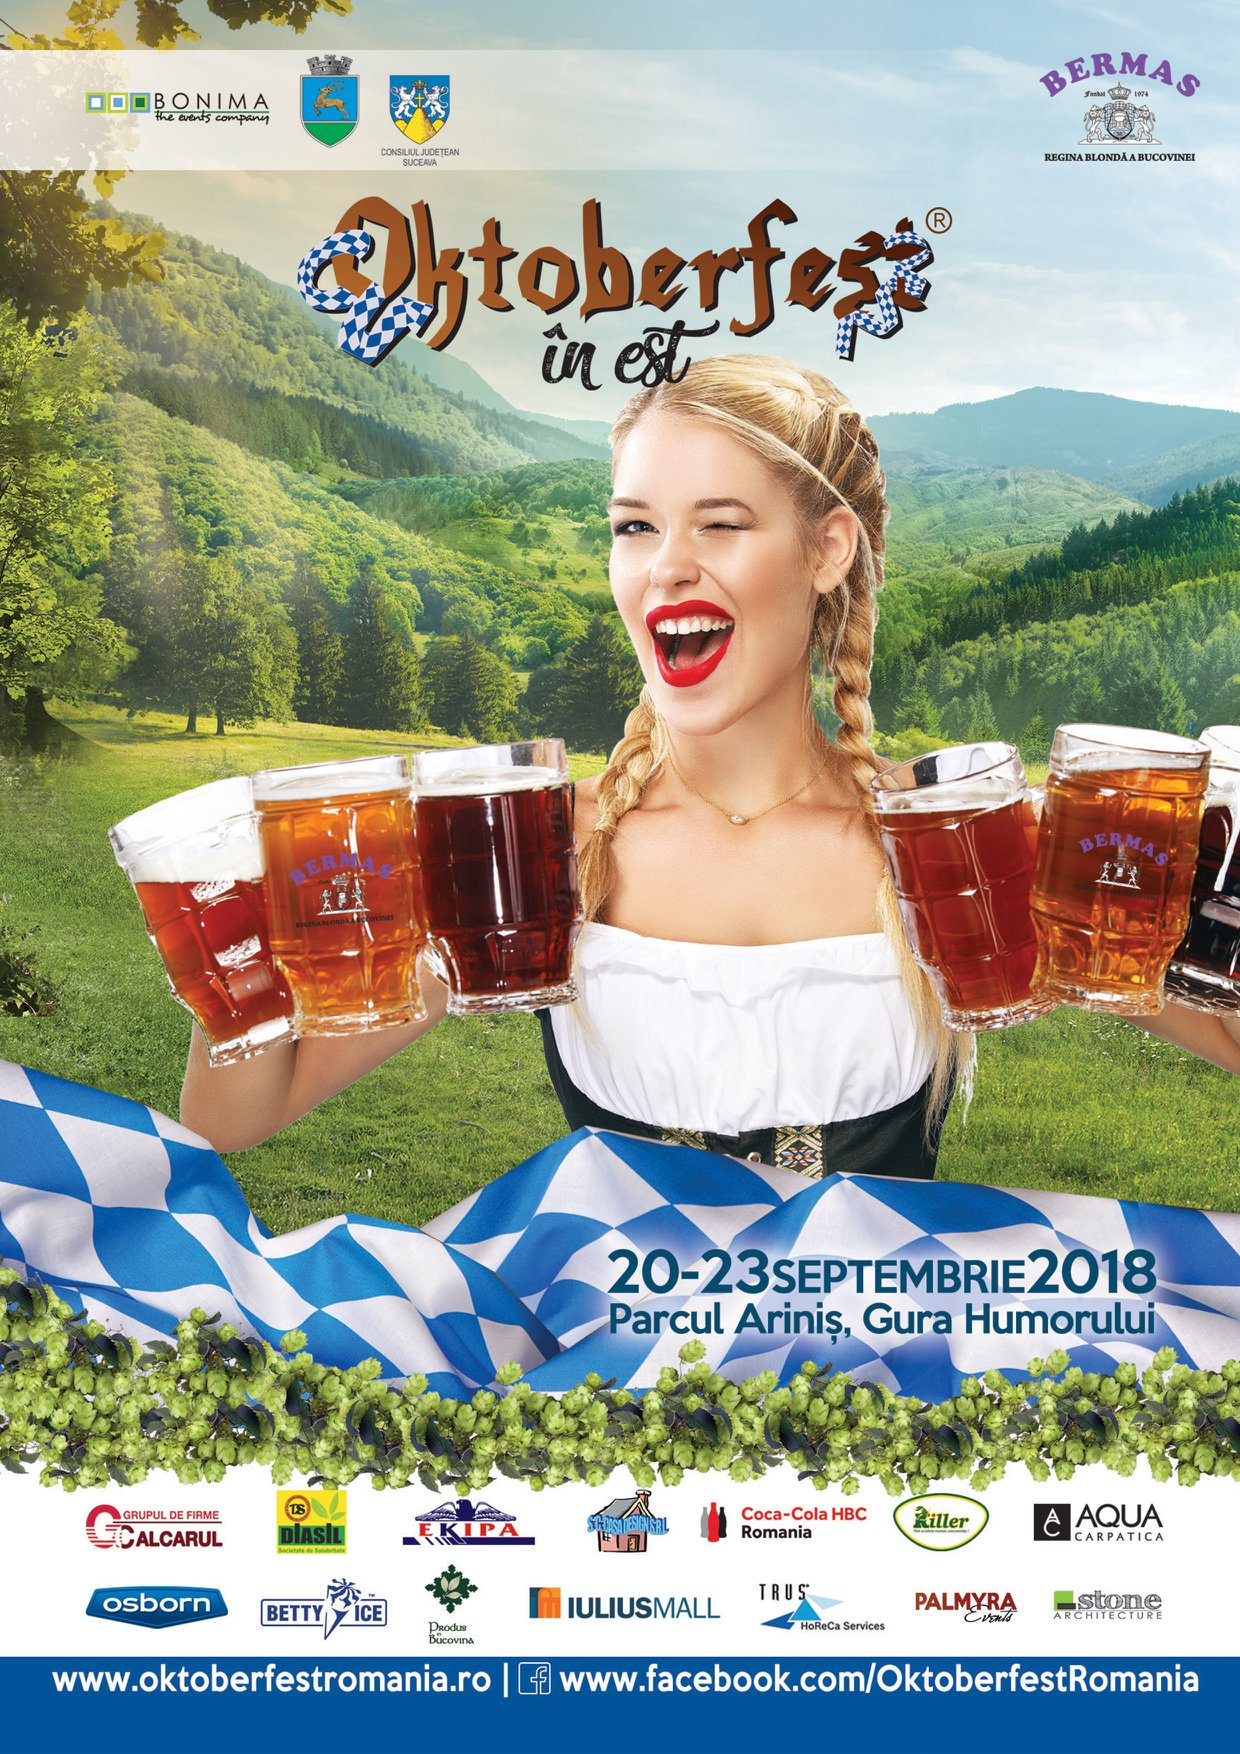 Oktoberfest în Est